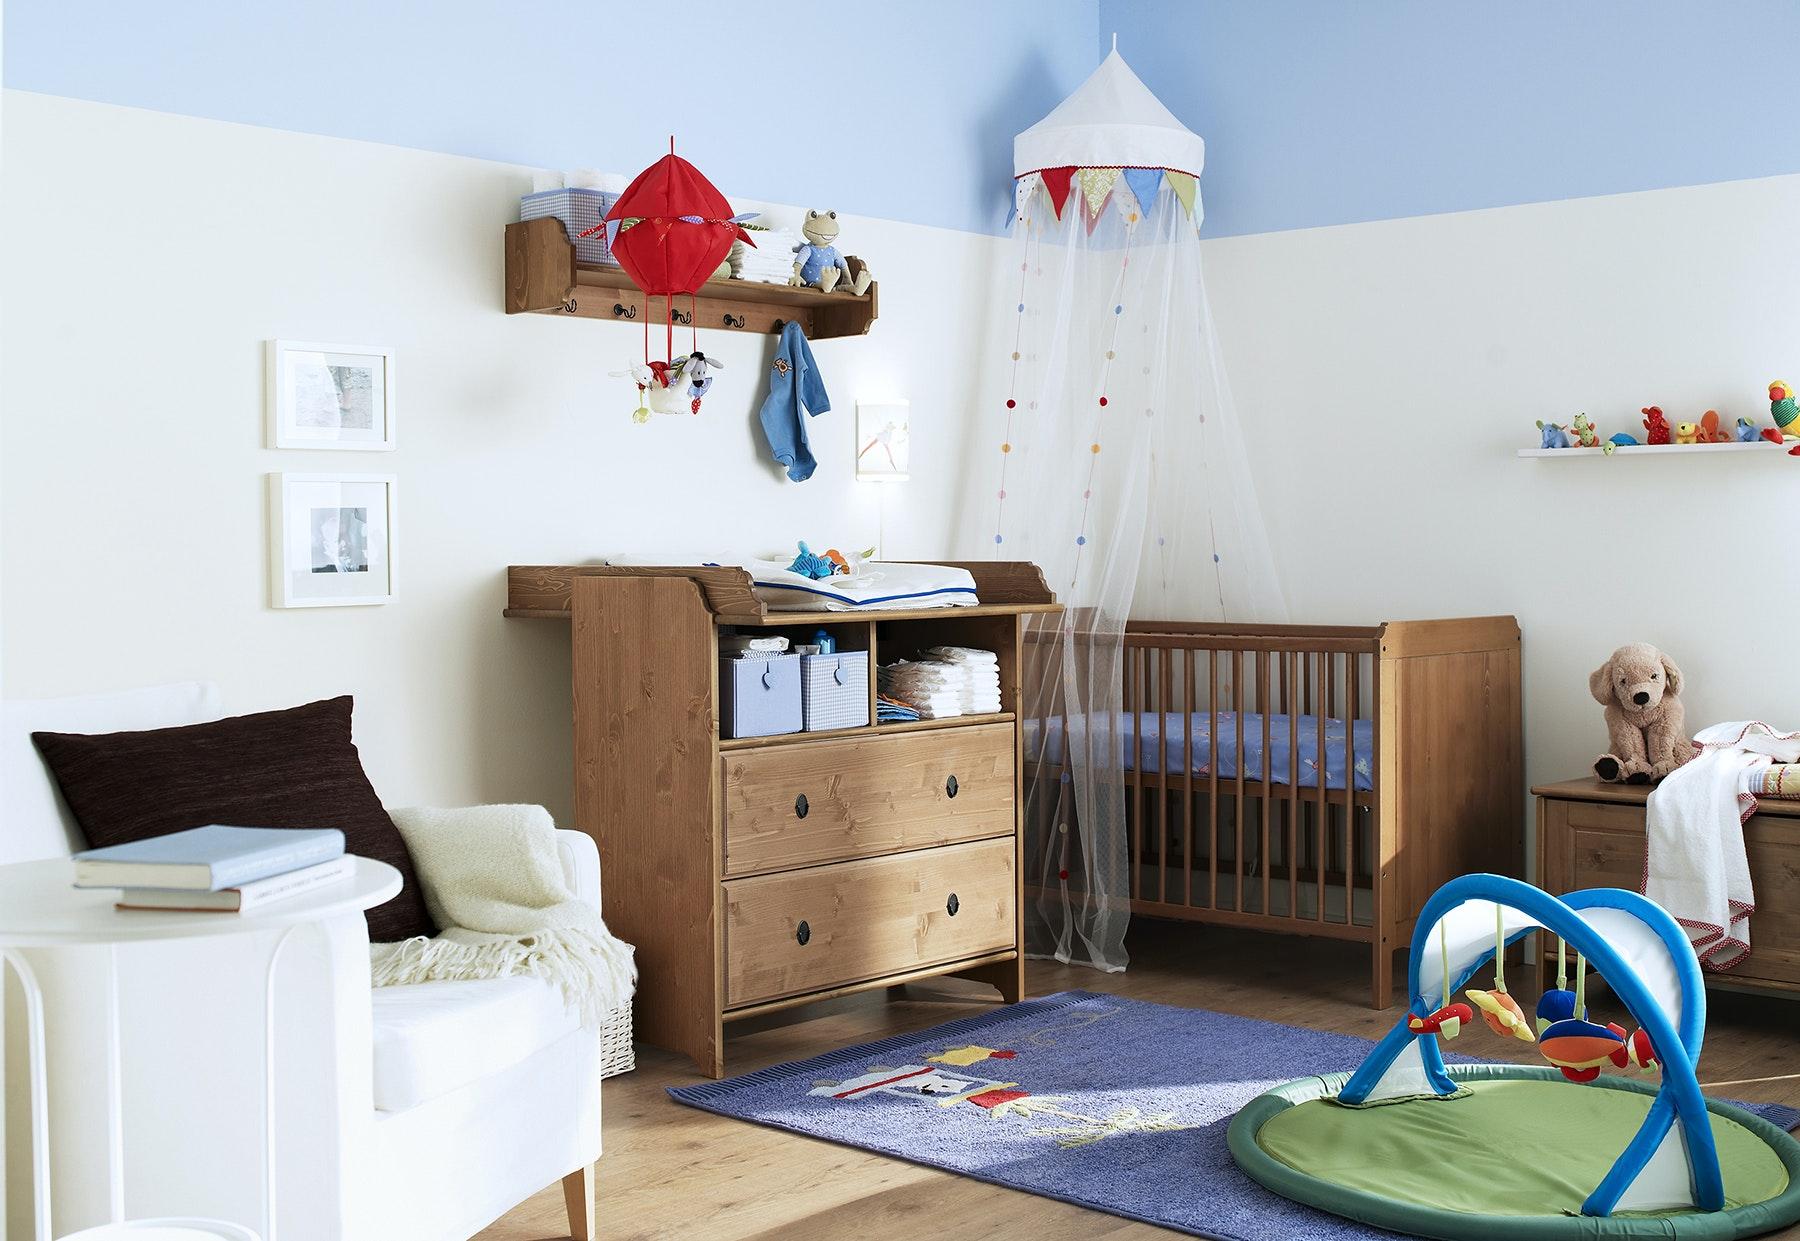 Chambres Enfants Ikea Beautiful Chambre Enfant Bureau Ides